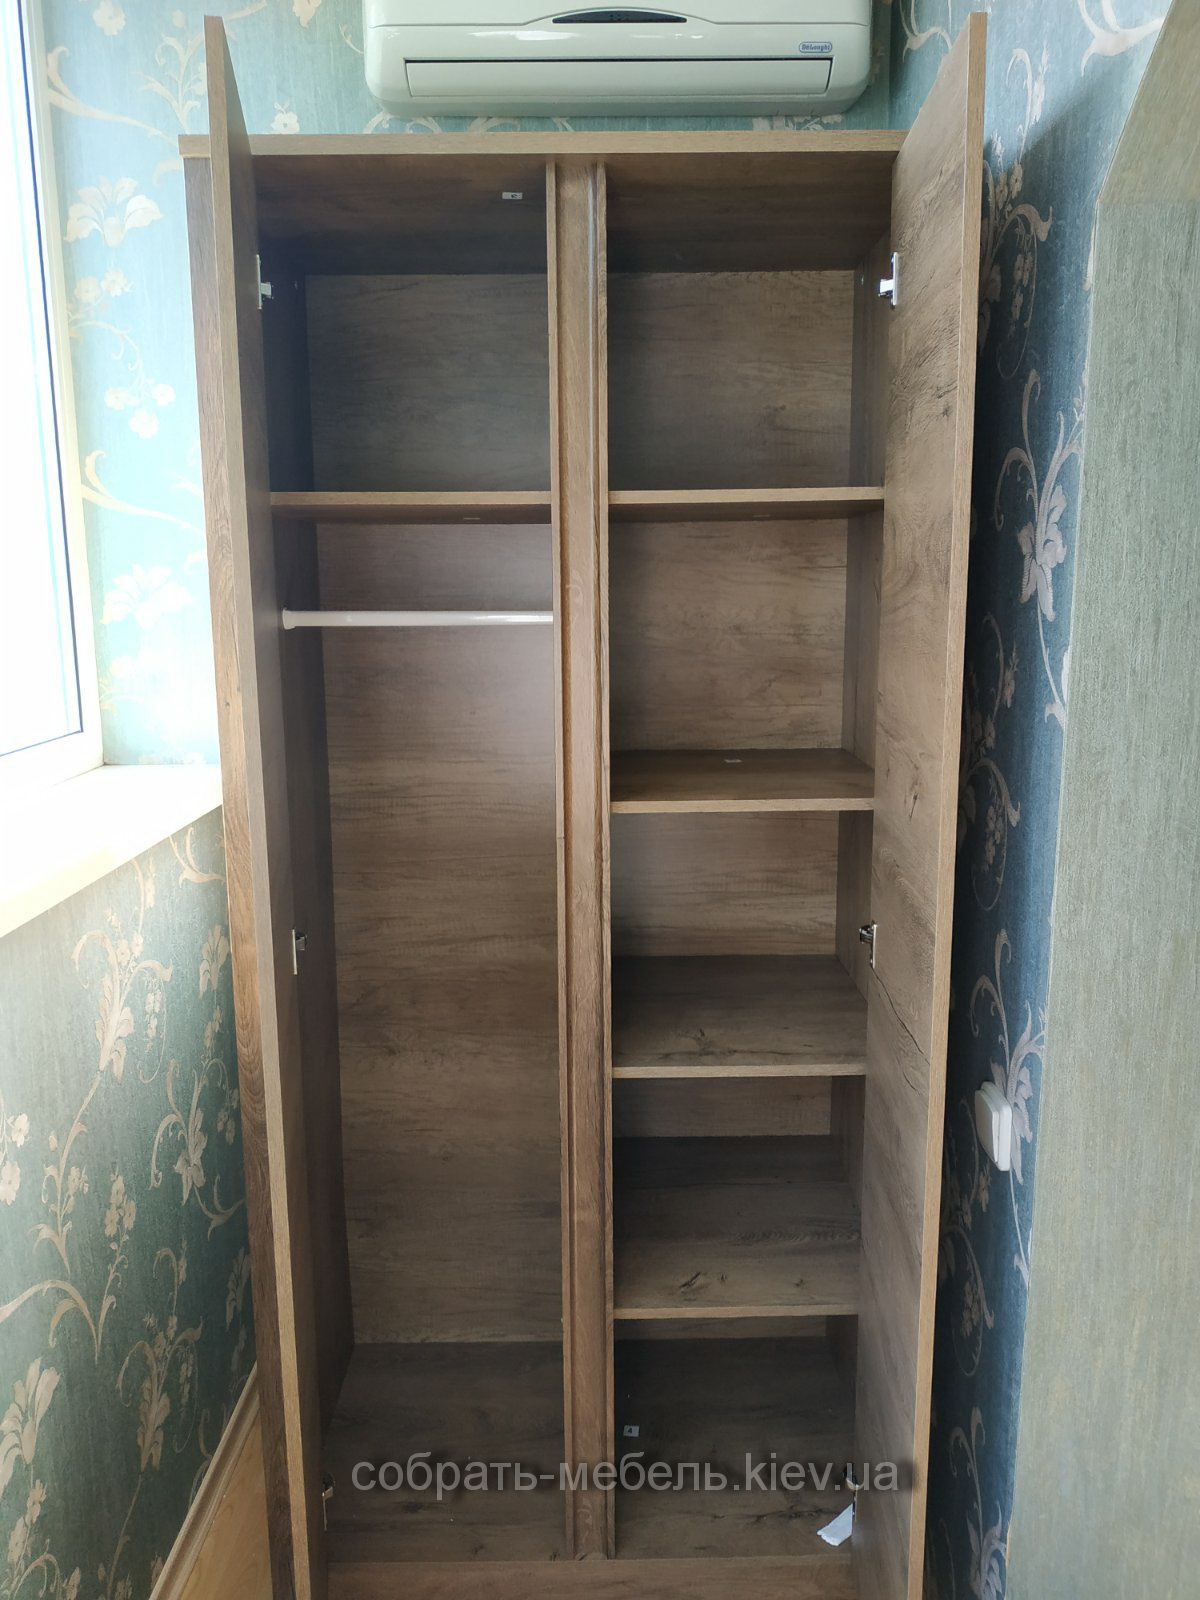 сборка шкафа для прихожей цена Киев